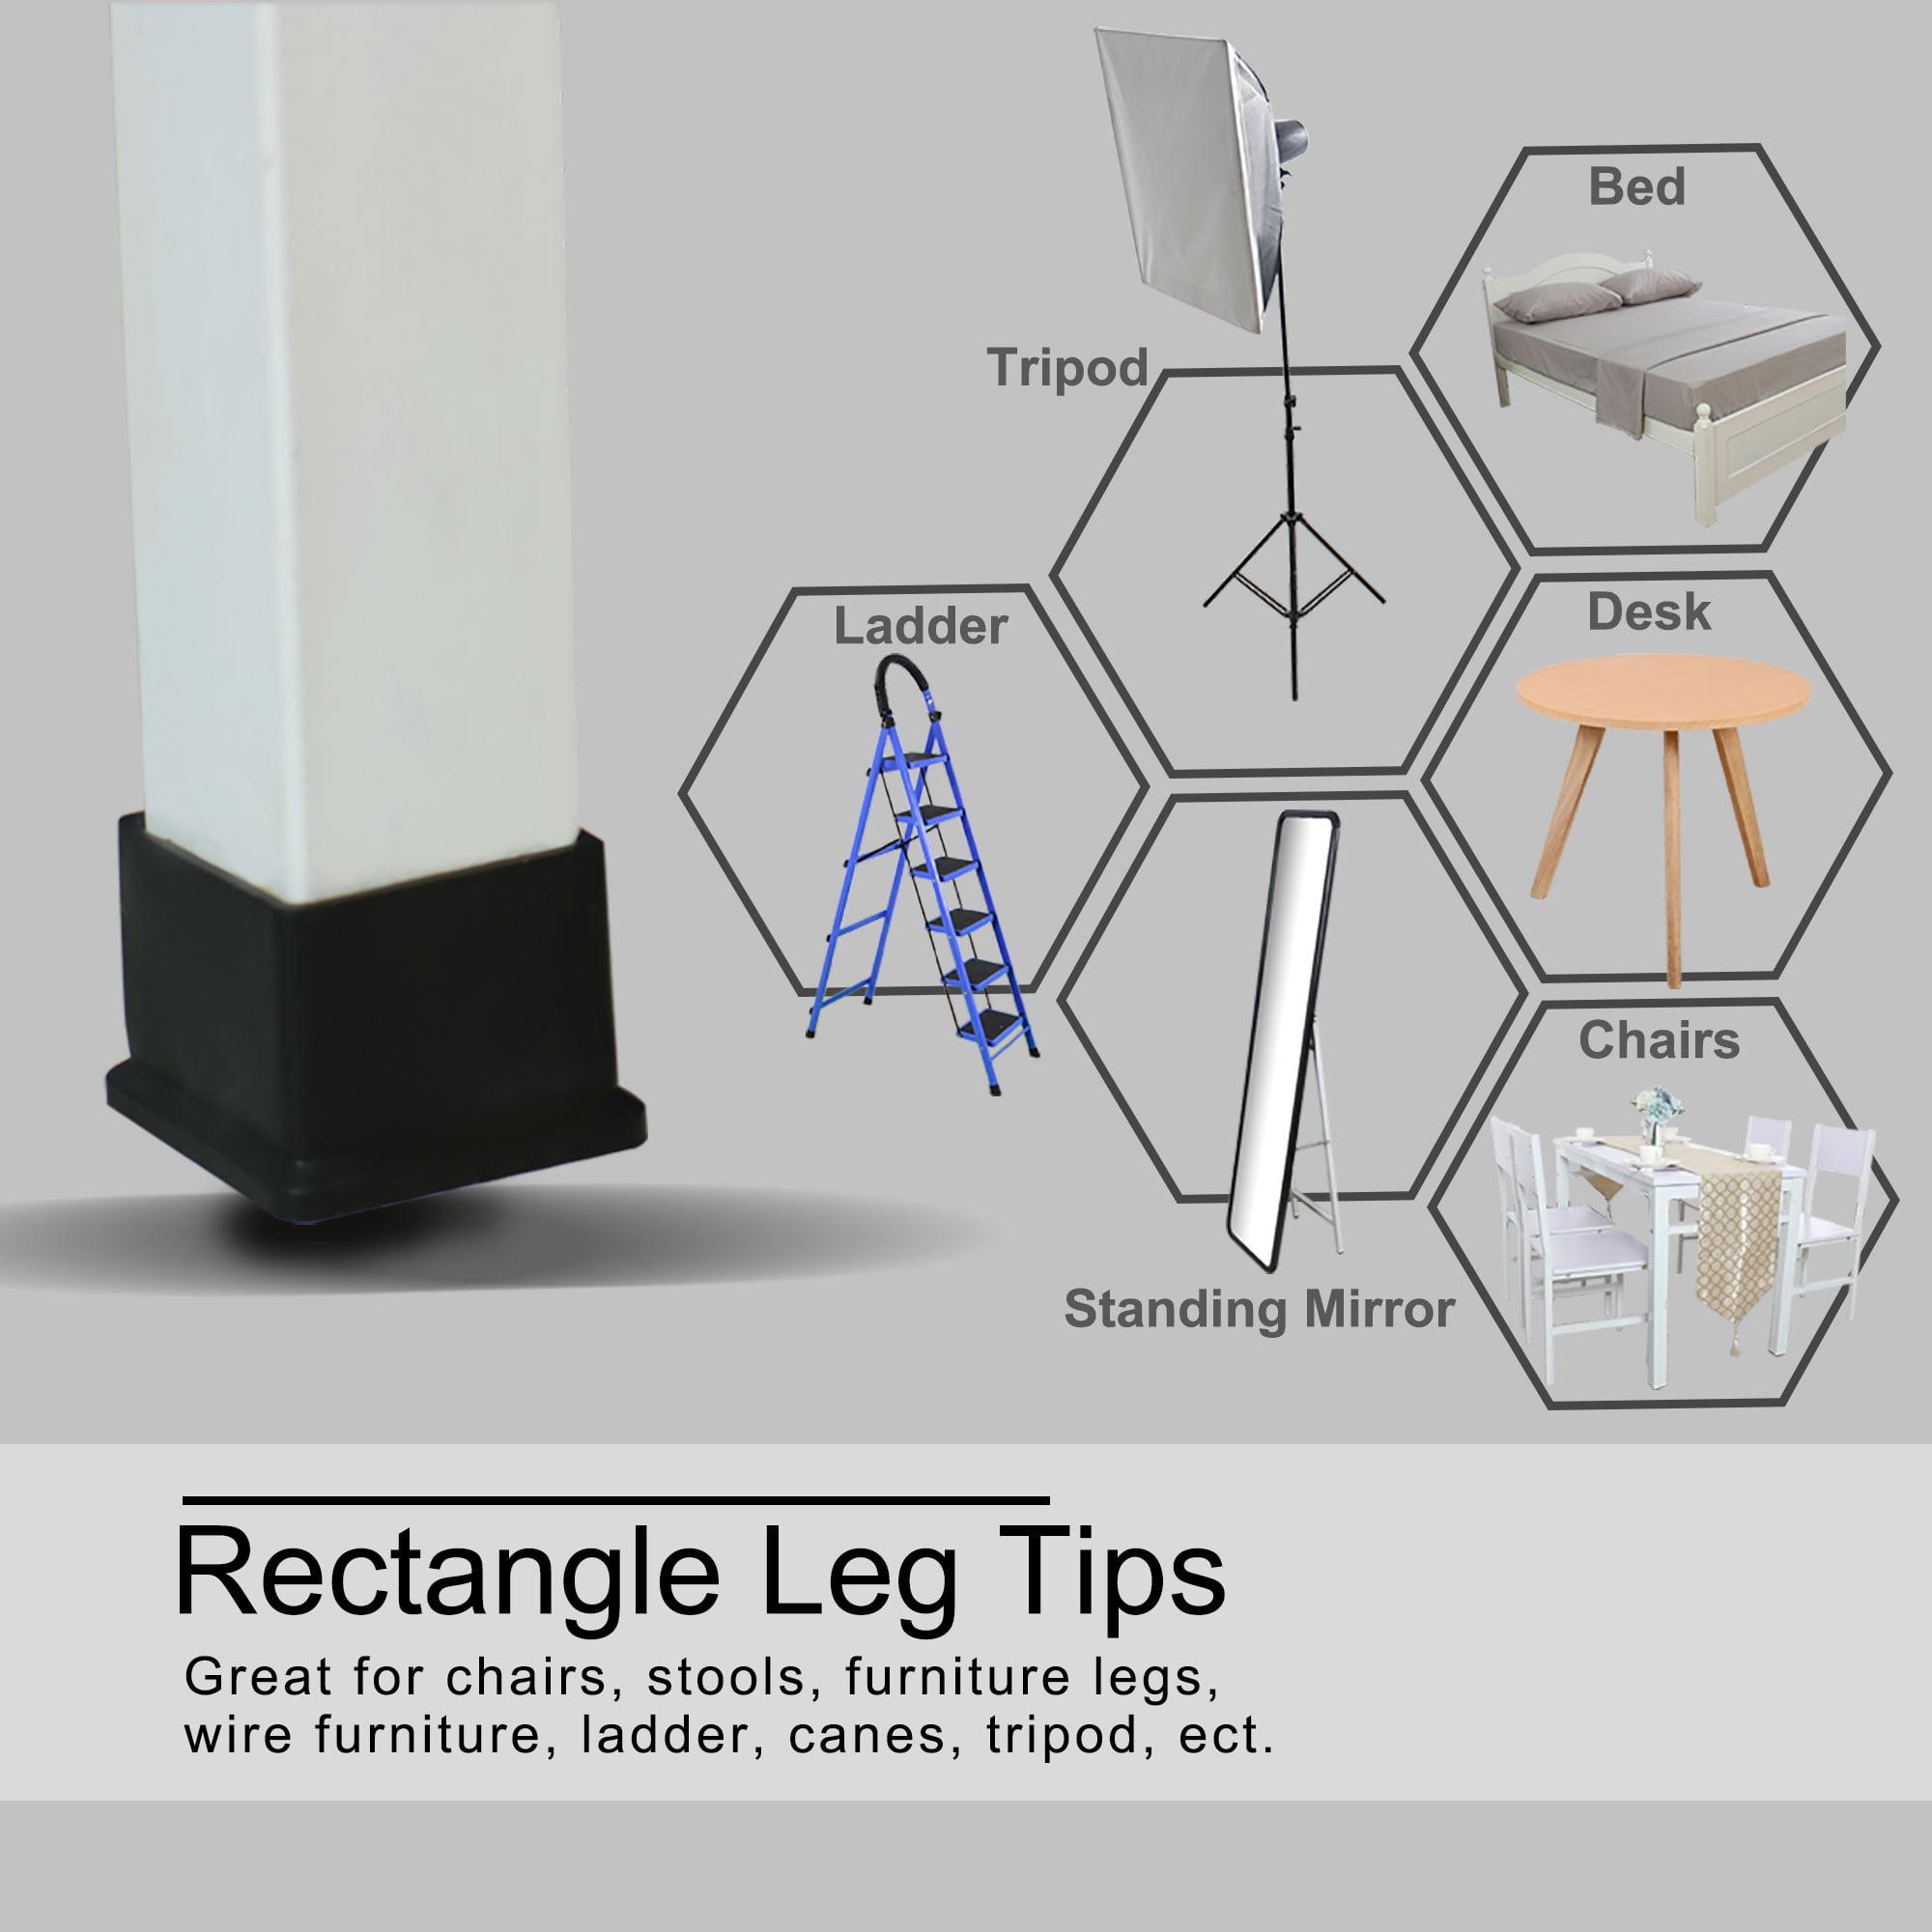 "Desk Table Leg Caps End Tip Home Furniture Protector 30pcs 2""x2"" (50x50mm) - image 6 de 7"